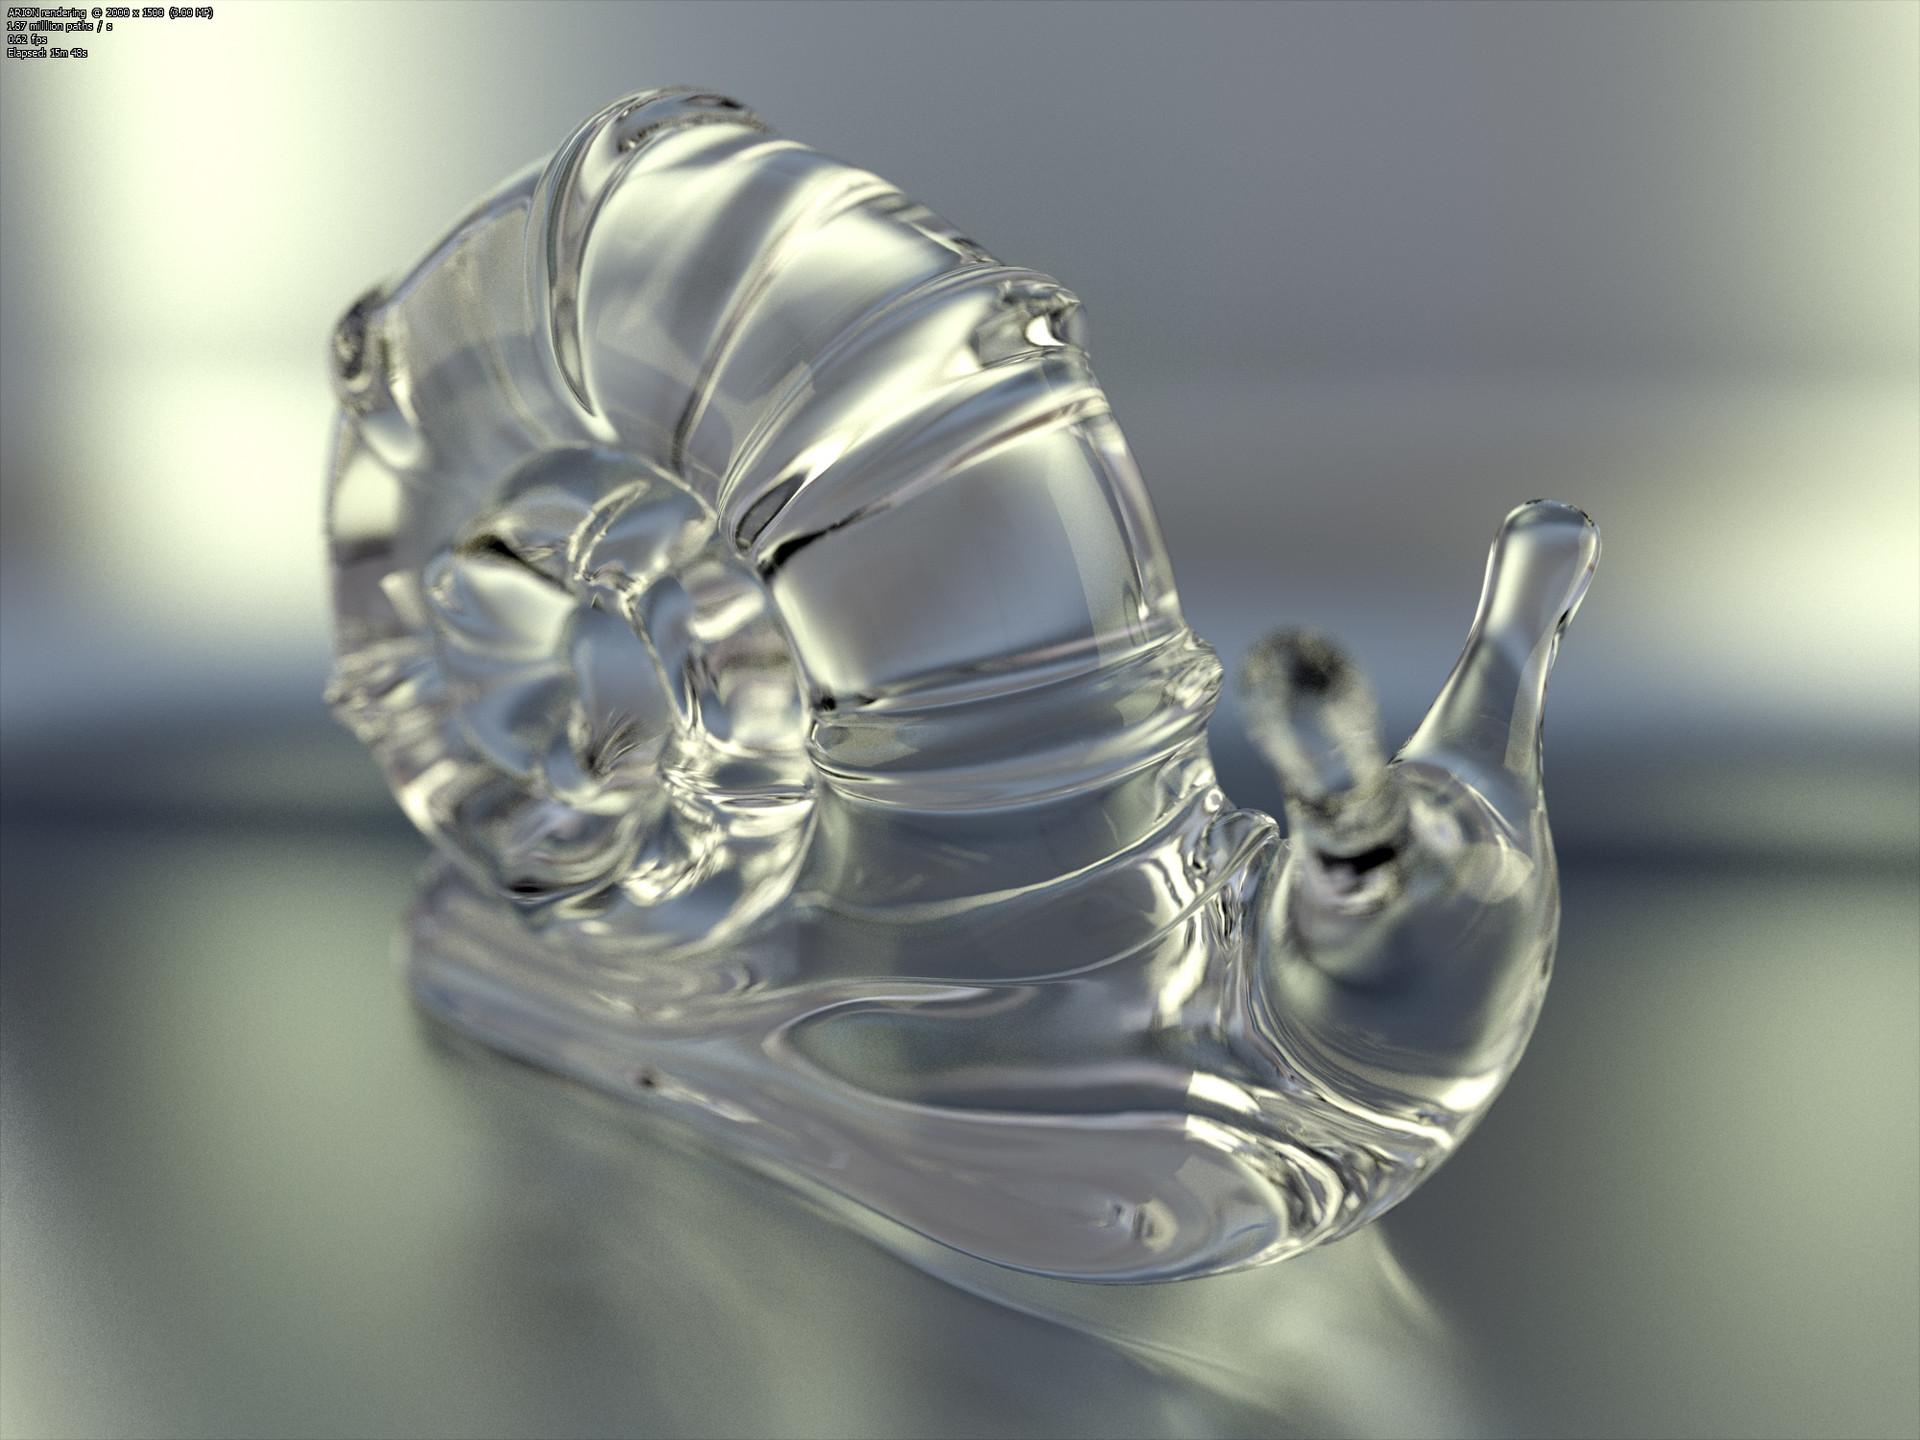 Nail khusnutdinov uli glass arion 16m